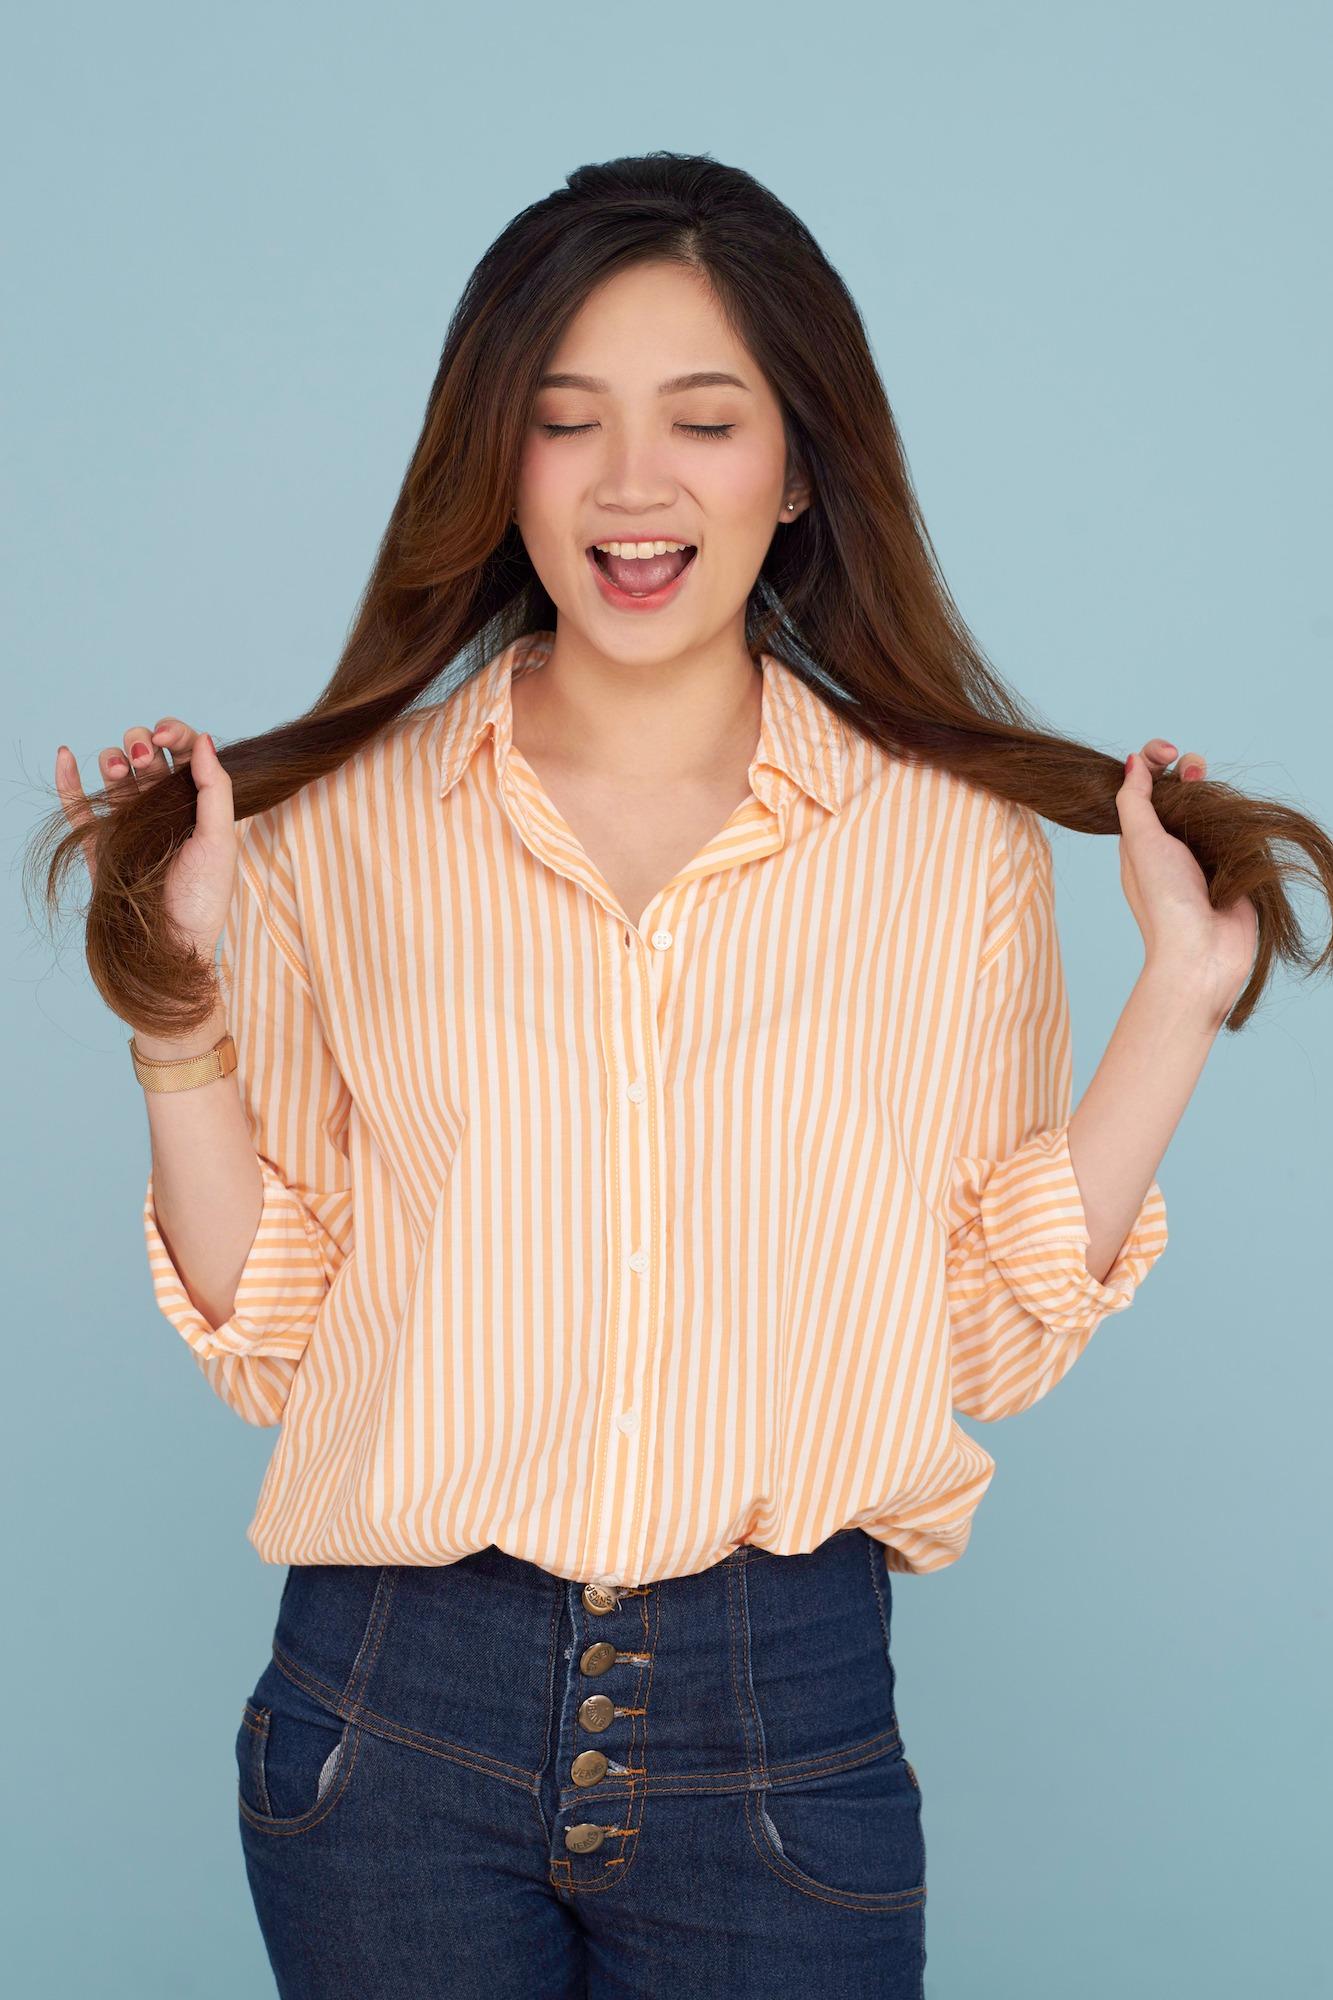 Wanita asia memegang kedua belahan rambut dan memainkan rambut - cara menghilangkan ketombe secara alami